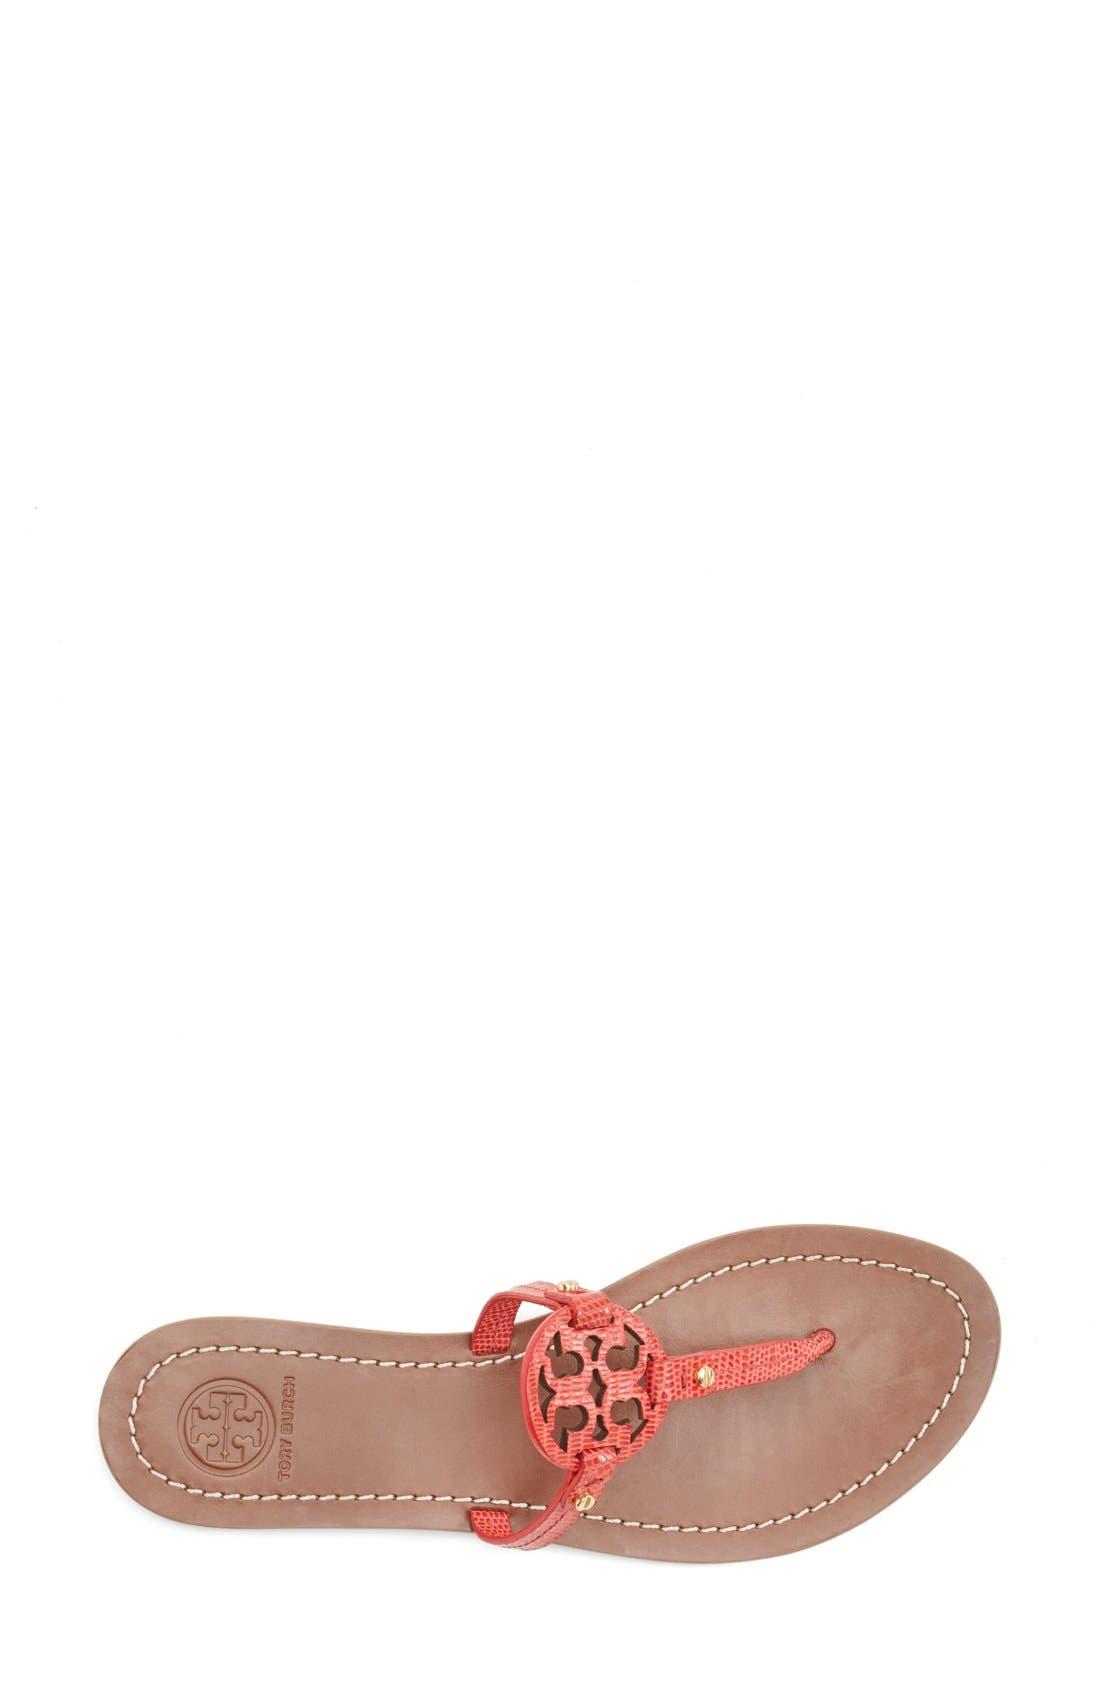 Alternate Image 3  - Tory Burch 'Mini Miller' Leather Thong Sandal (Women)